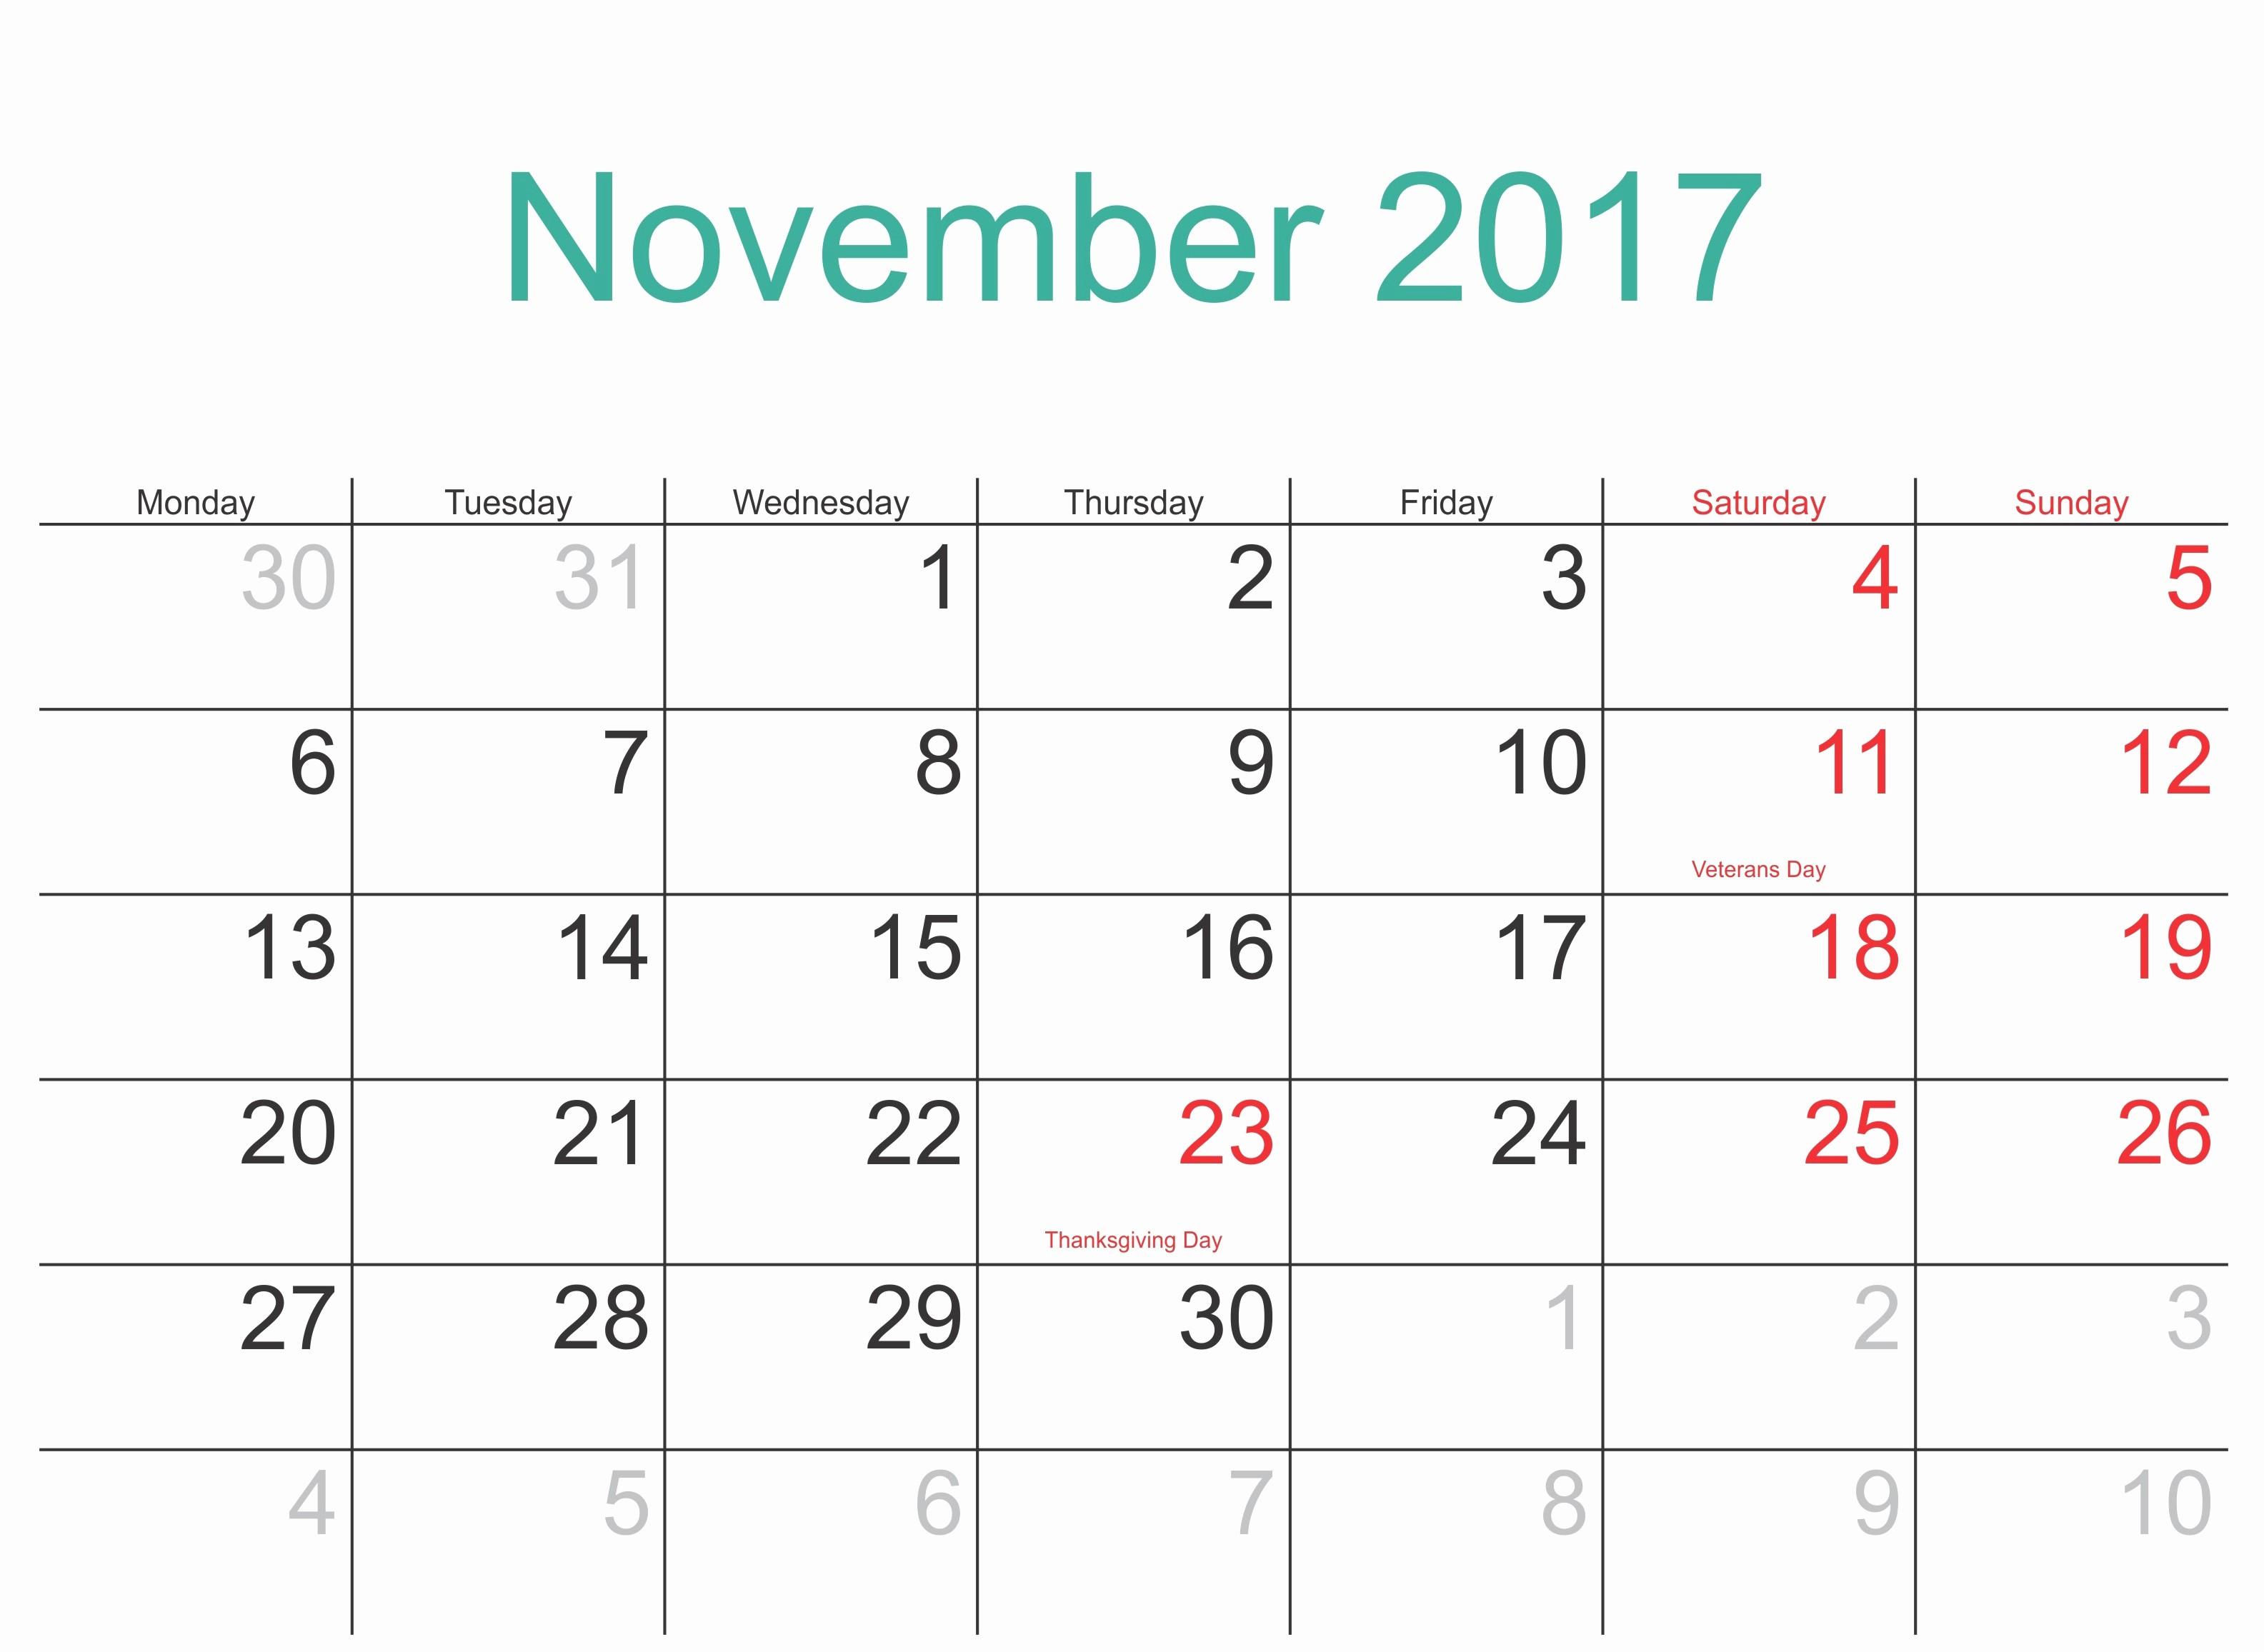 Excel 2017 Calendar with Holidays Unique November 2017 Printable Calendar Template Holidays Excel